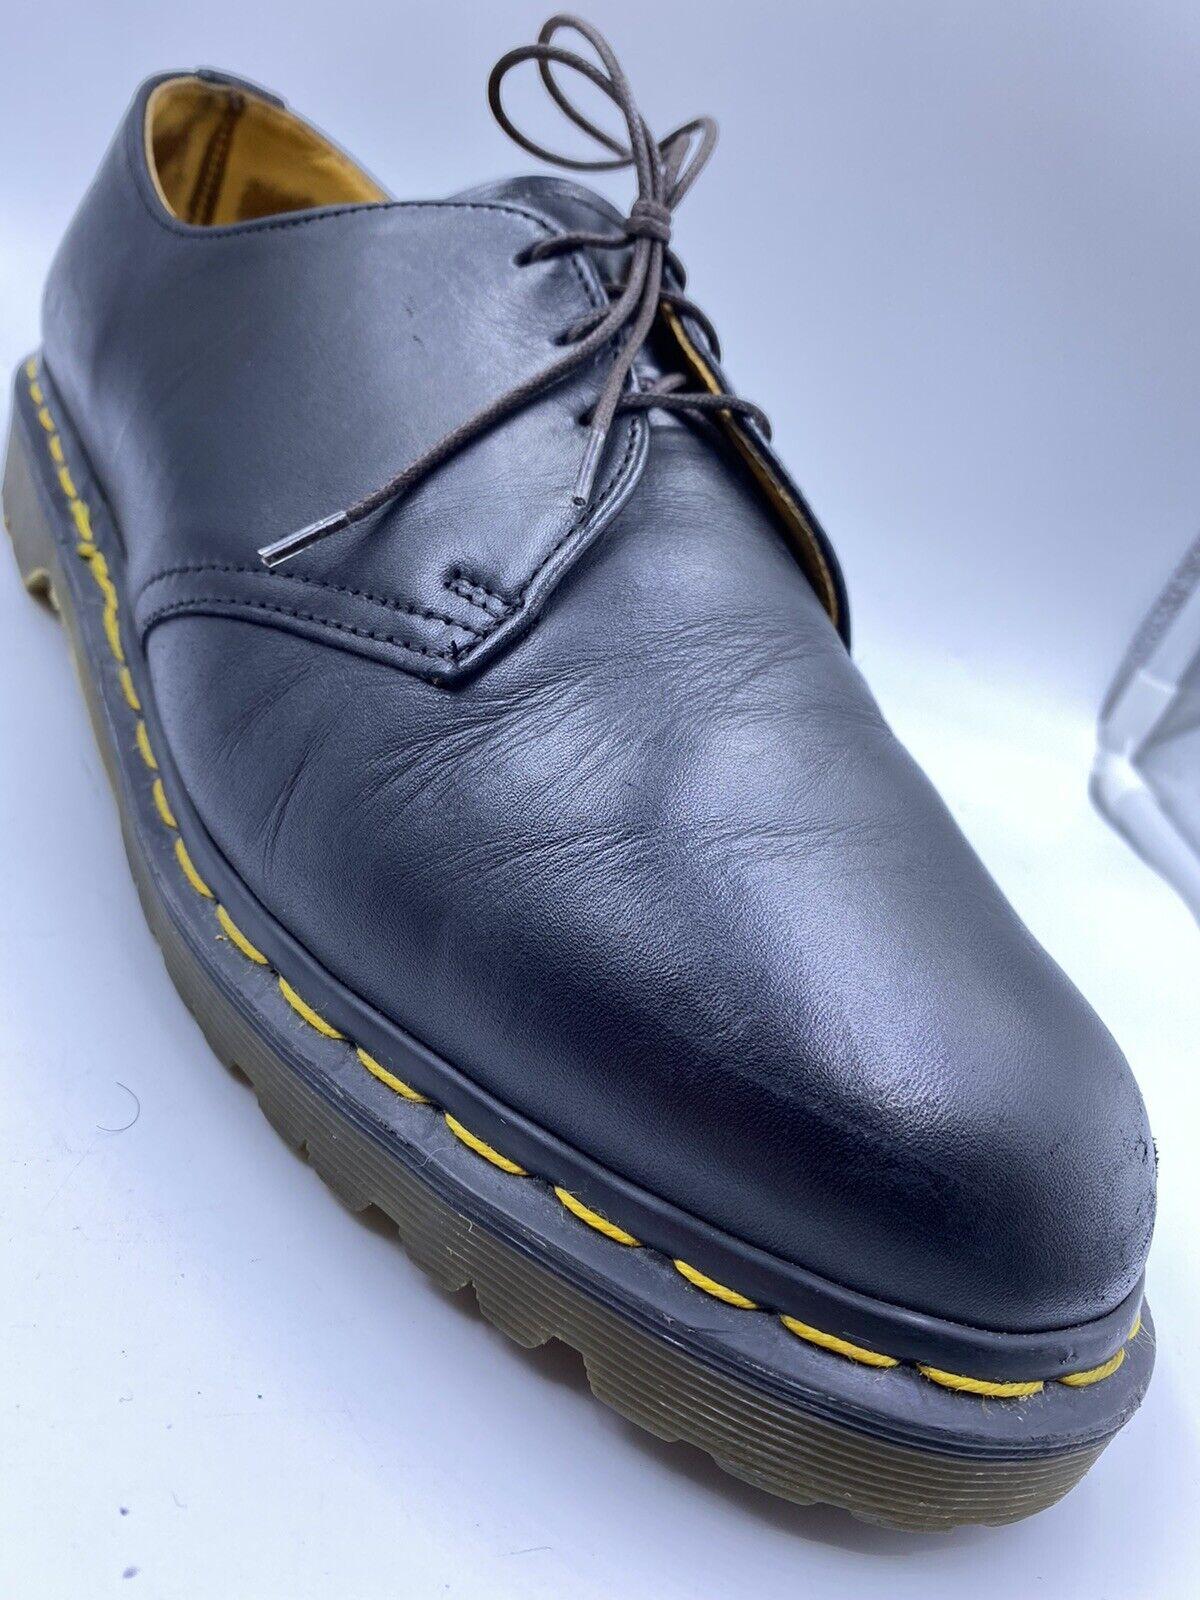 Dr. Martens BLACK Leather Shoes